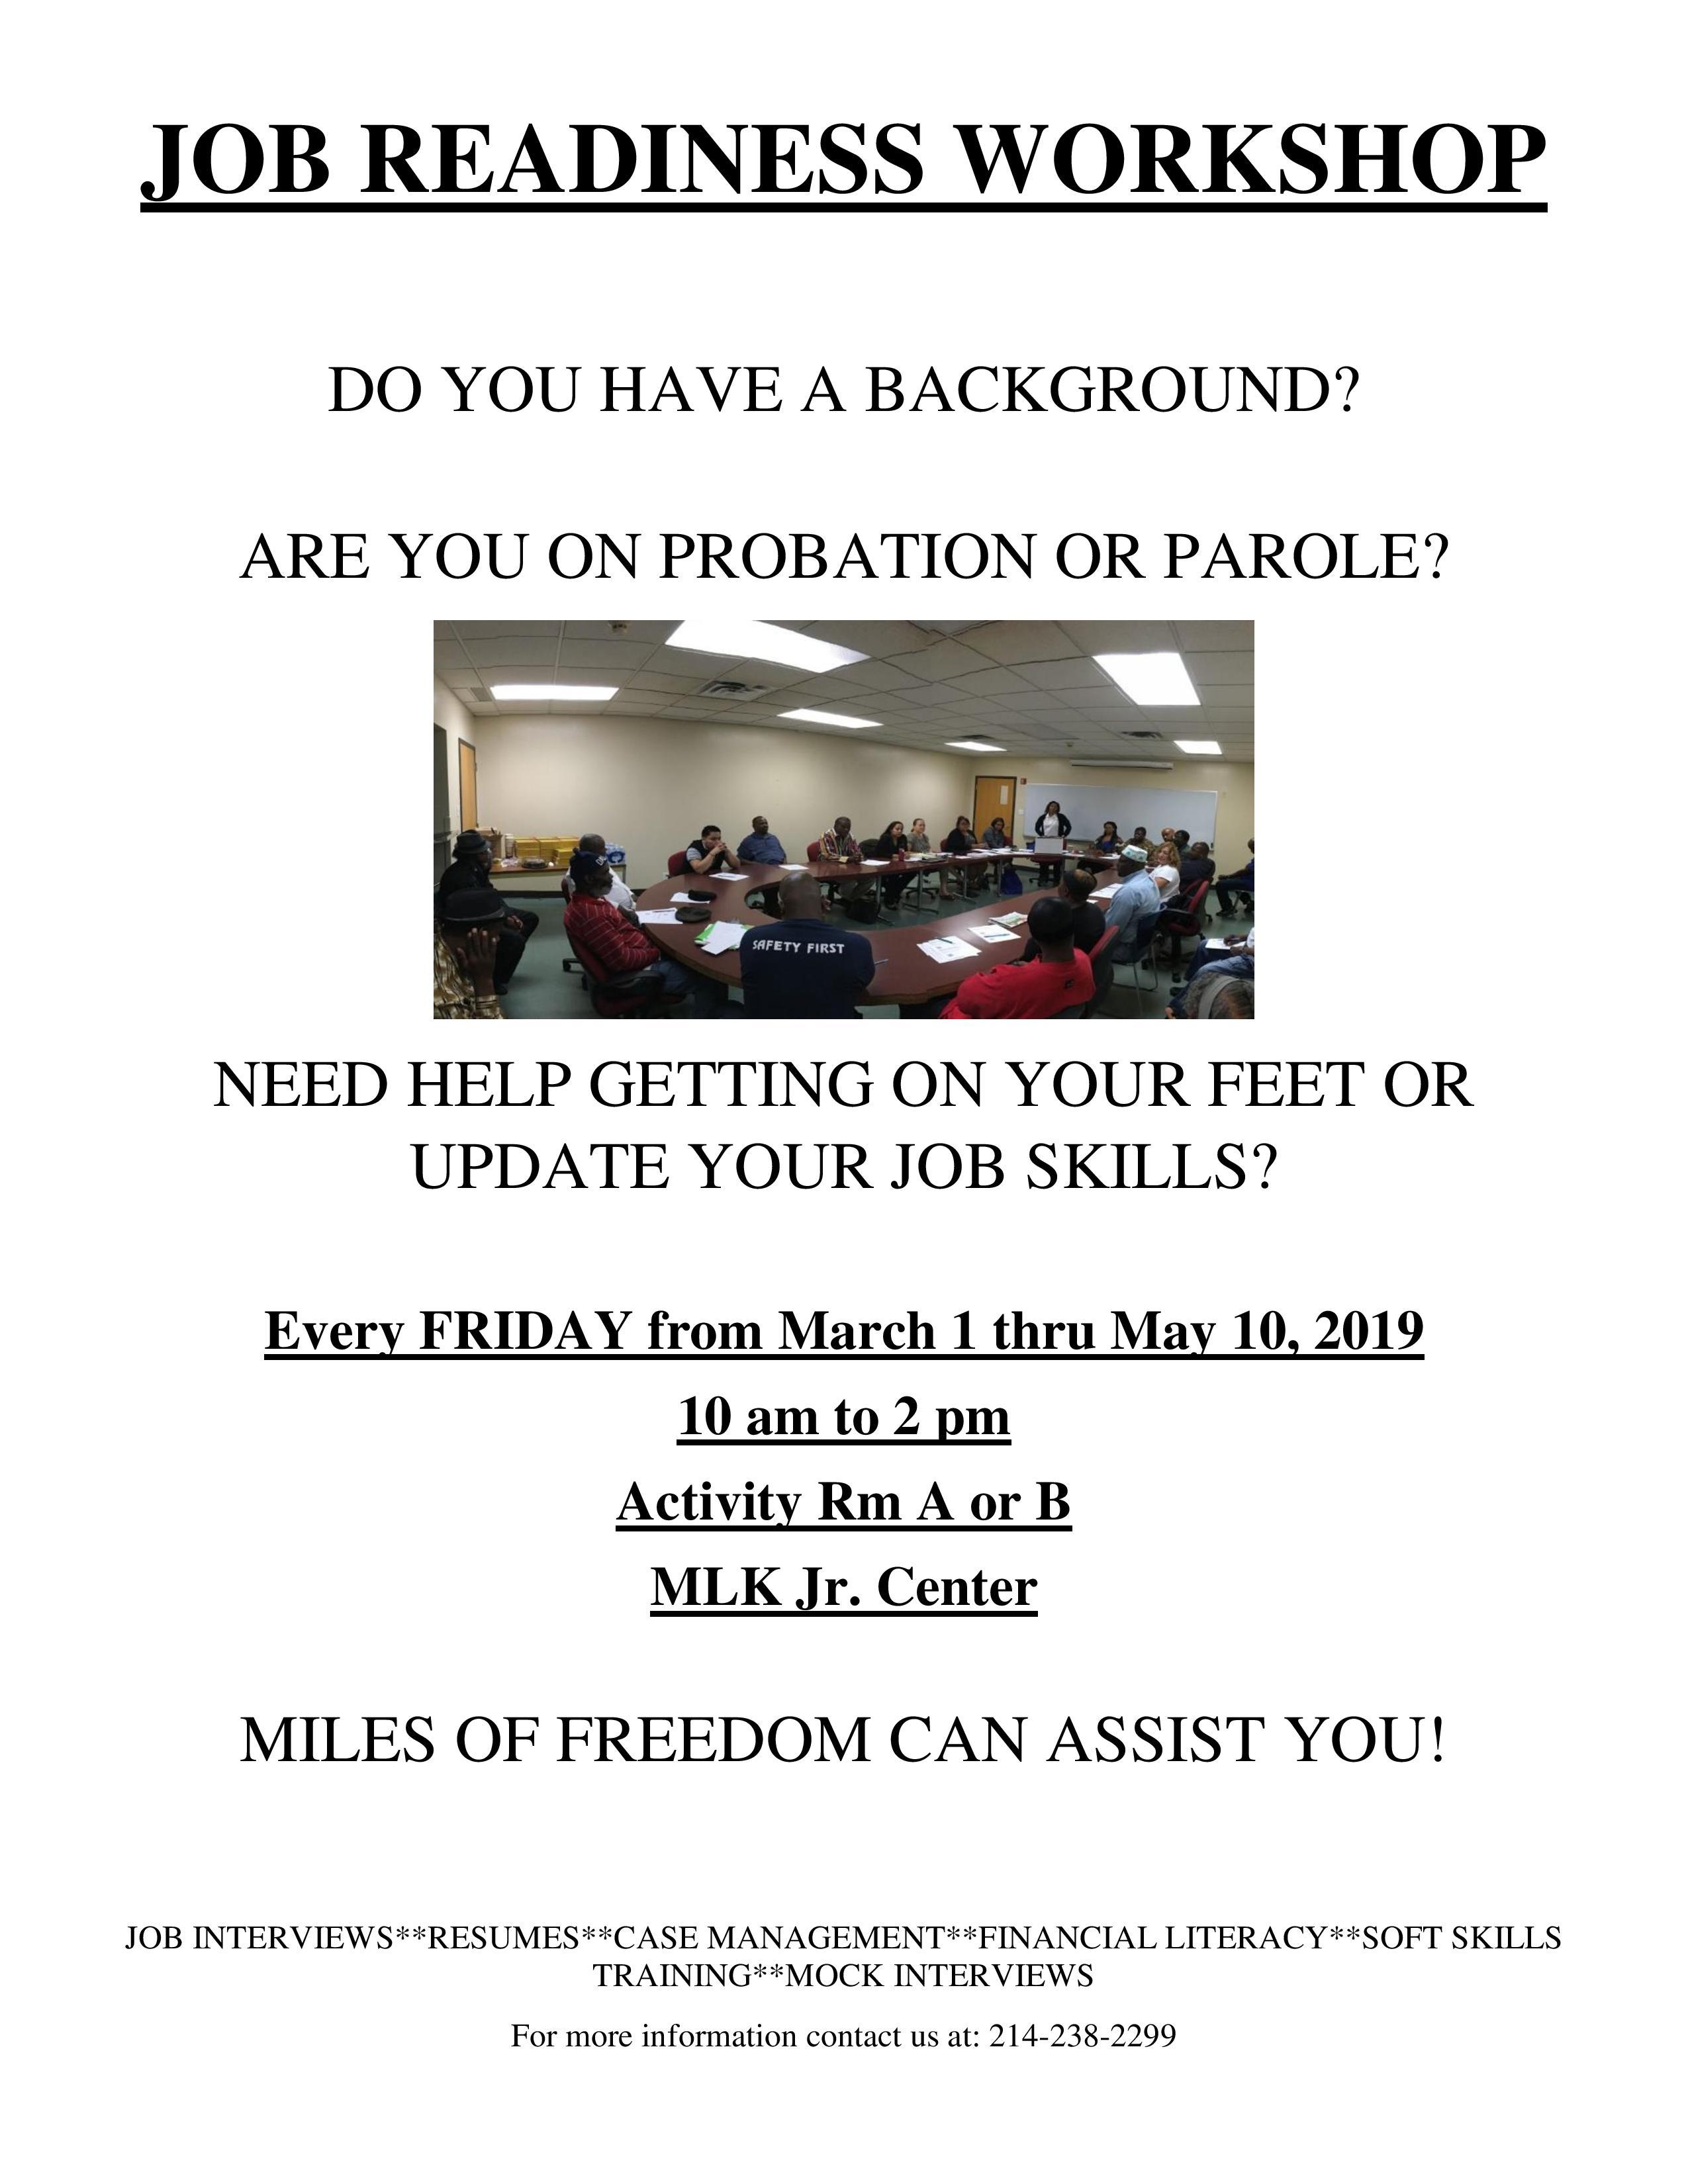 Miles of Freedom Job Readiness Workshop @ MLK, Jr. Community Center